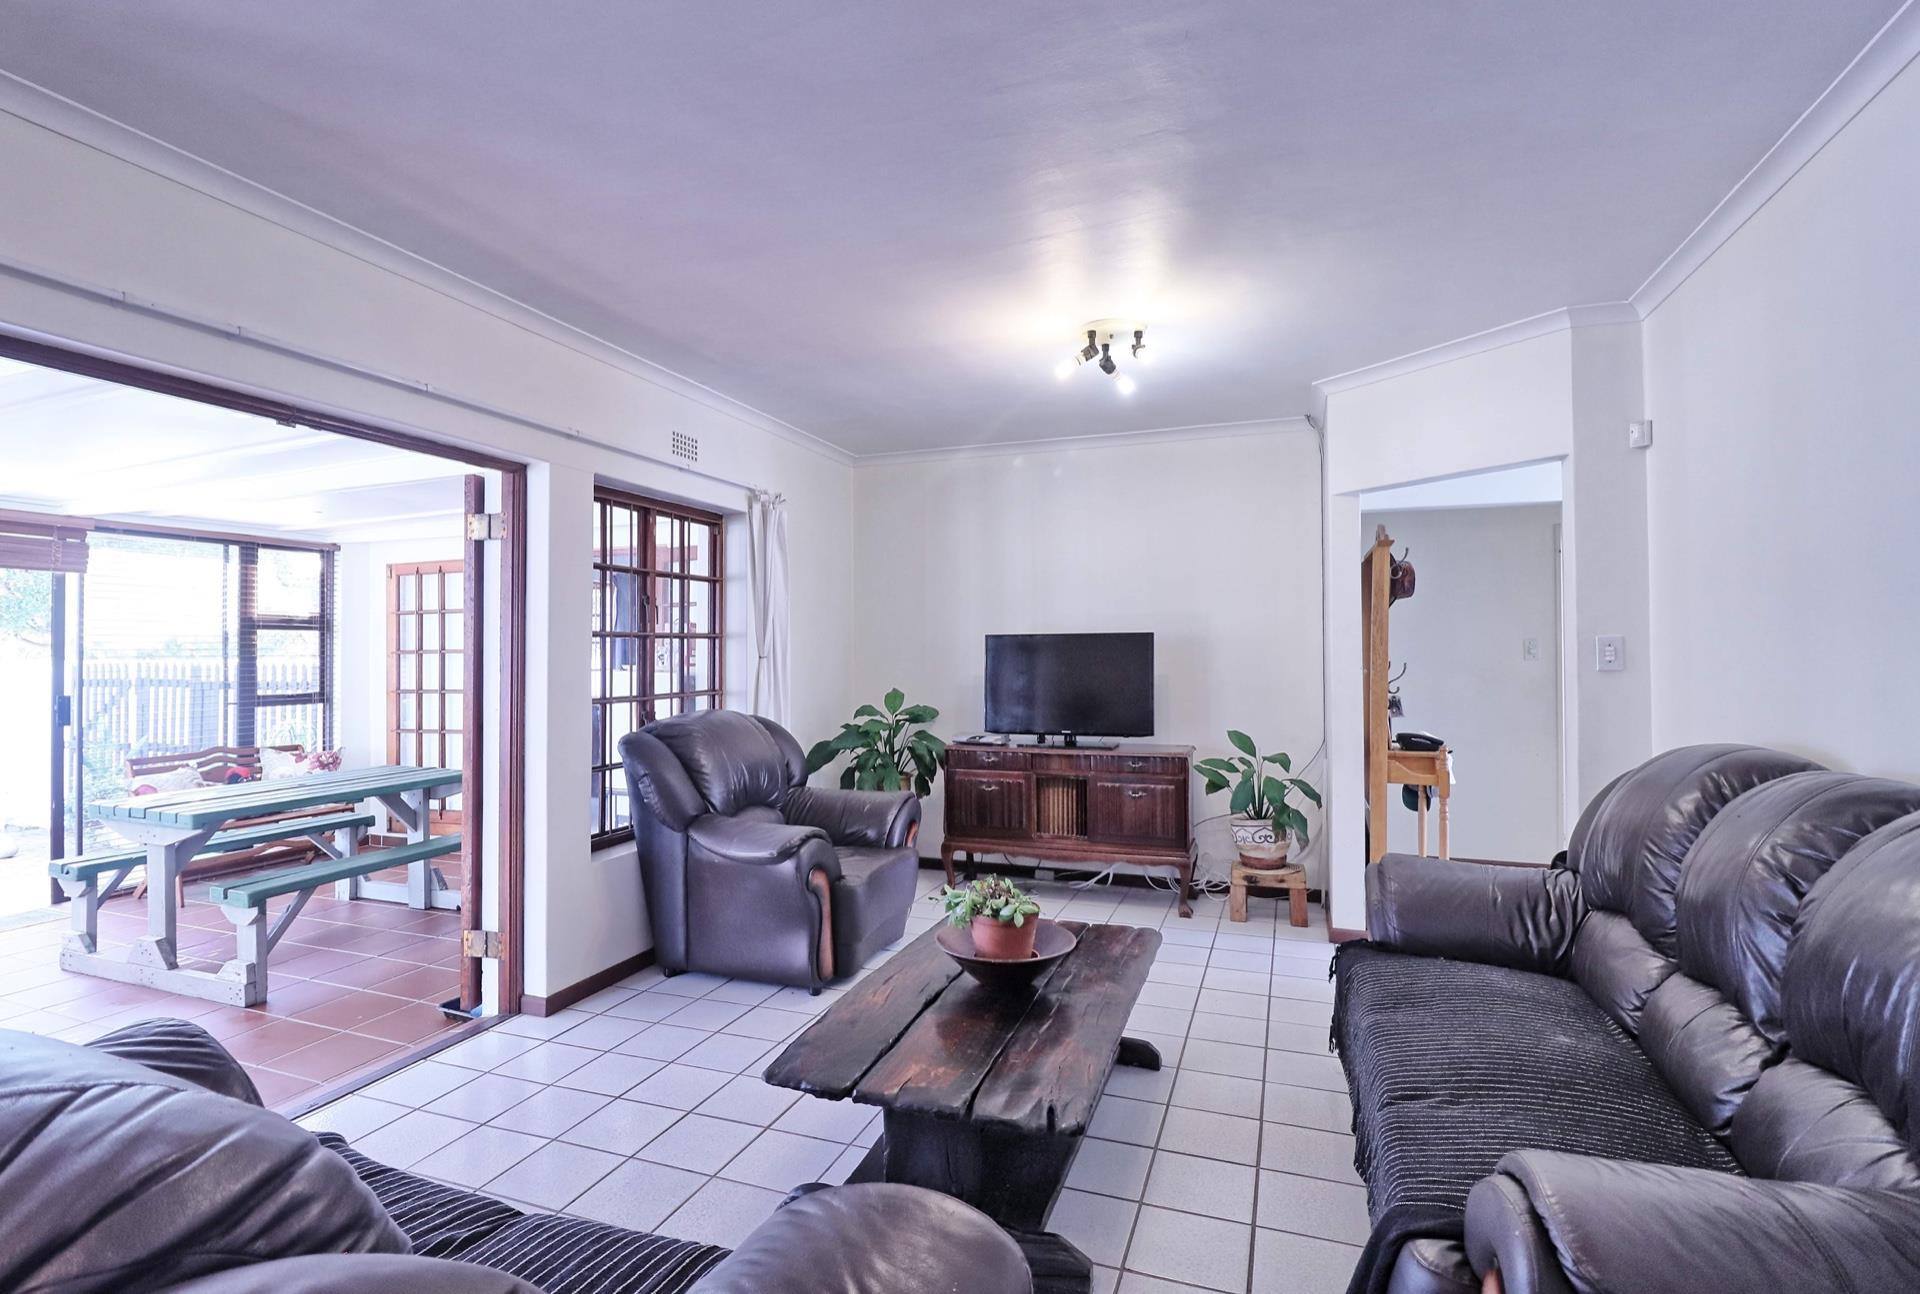 3 Bedroom House For Sale in Fish Hoek